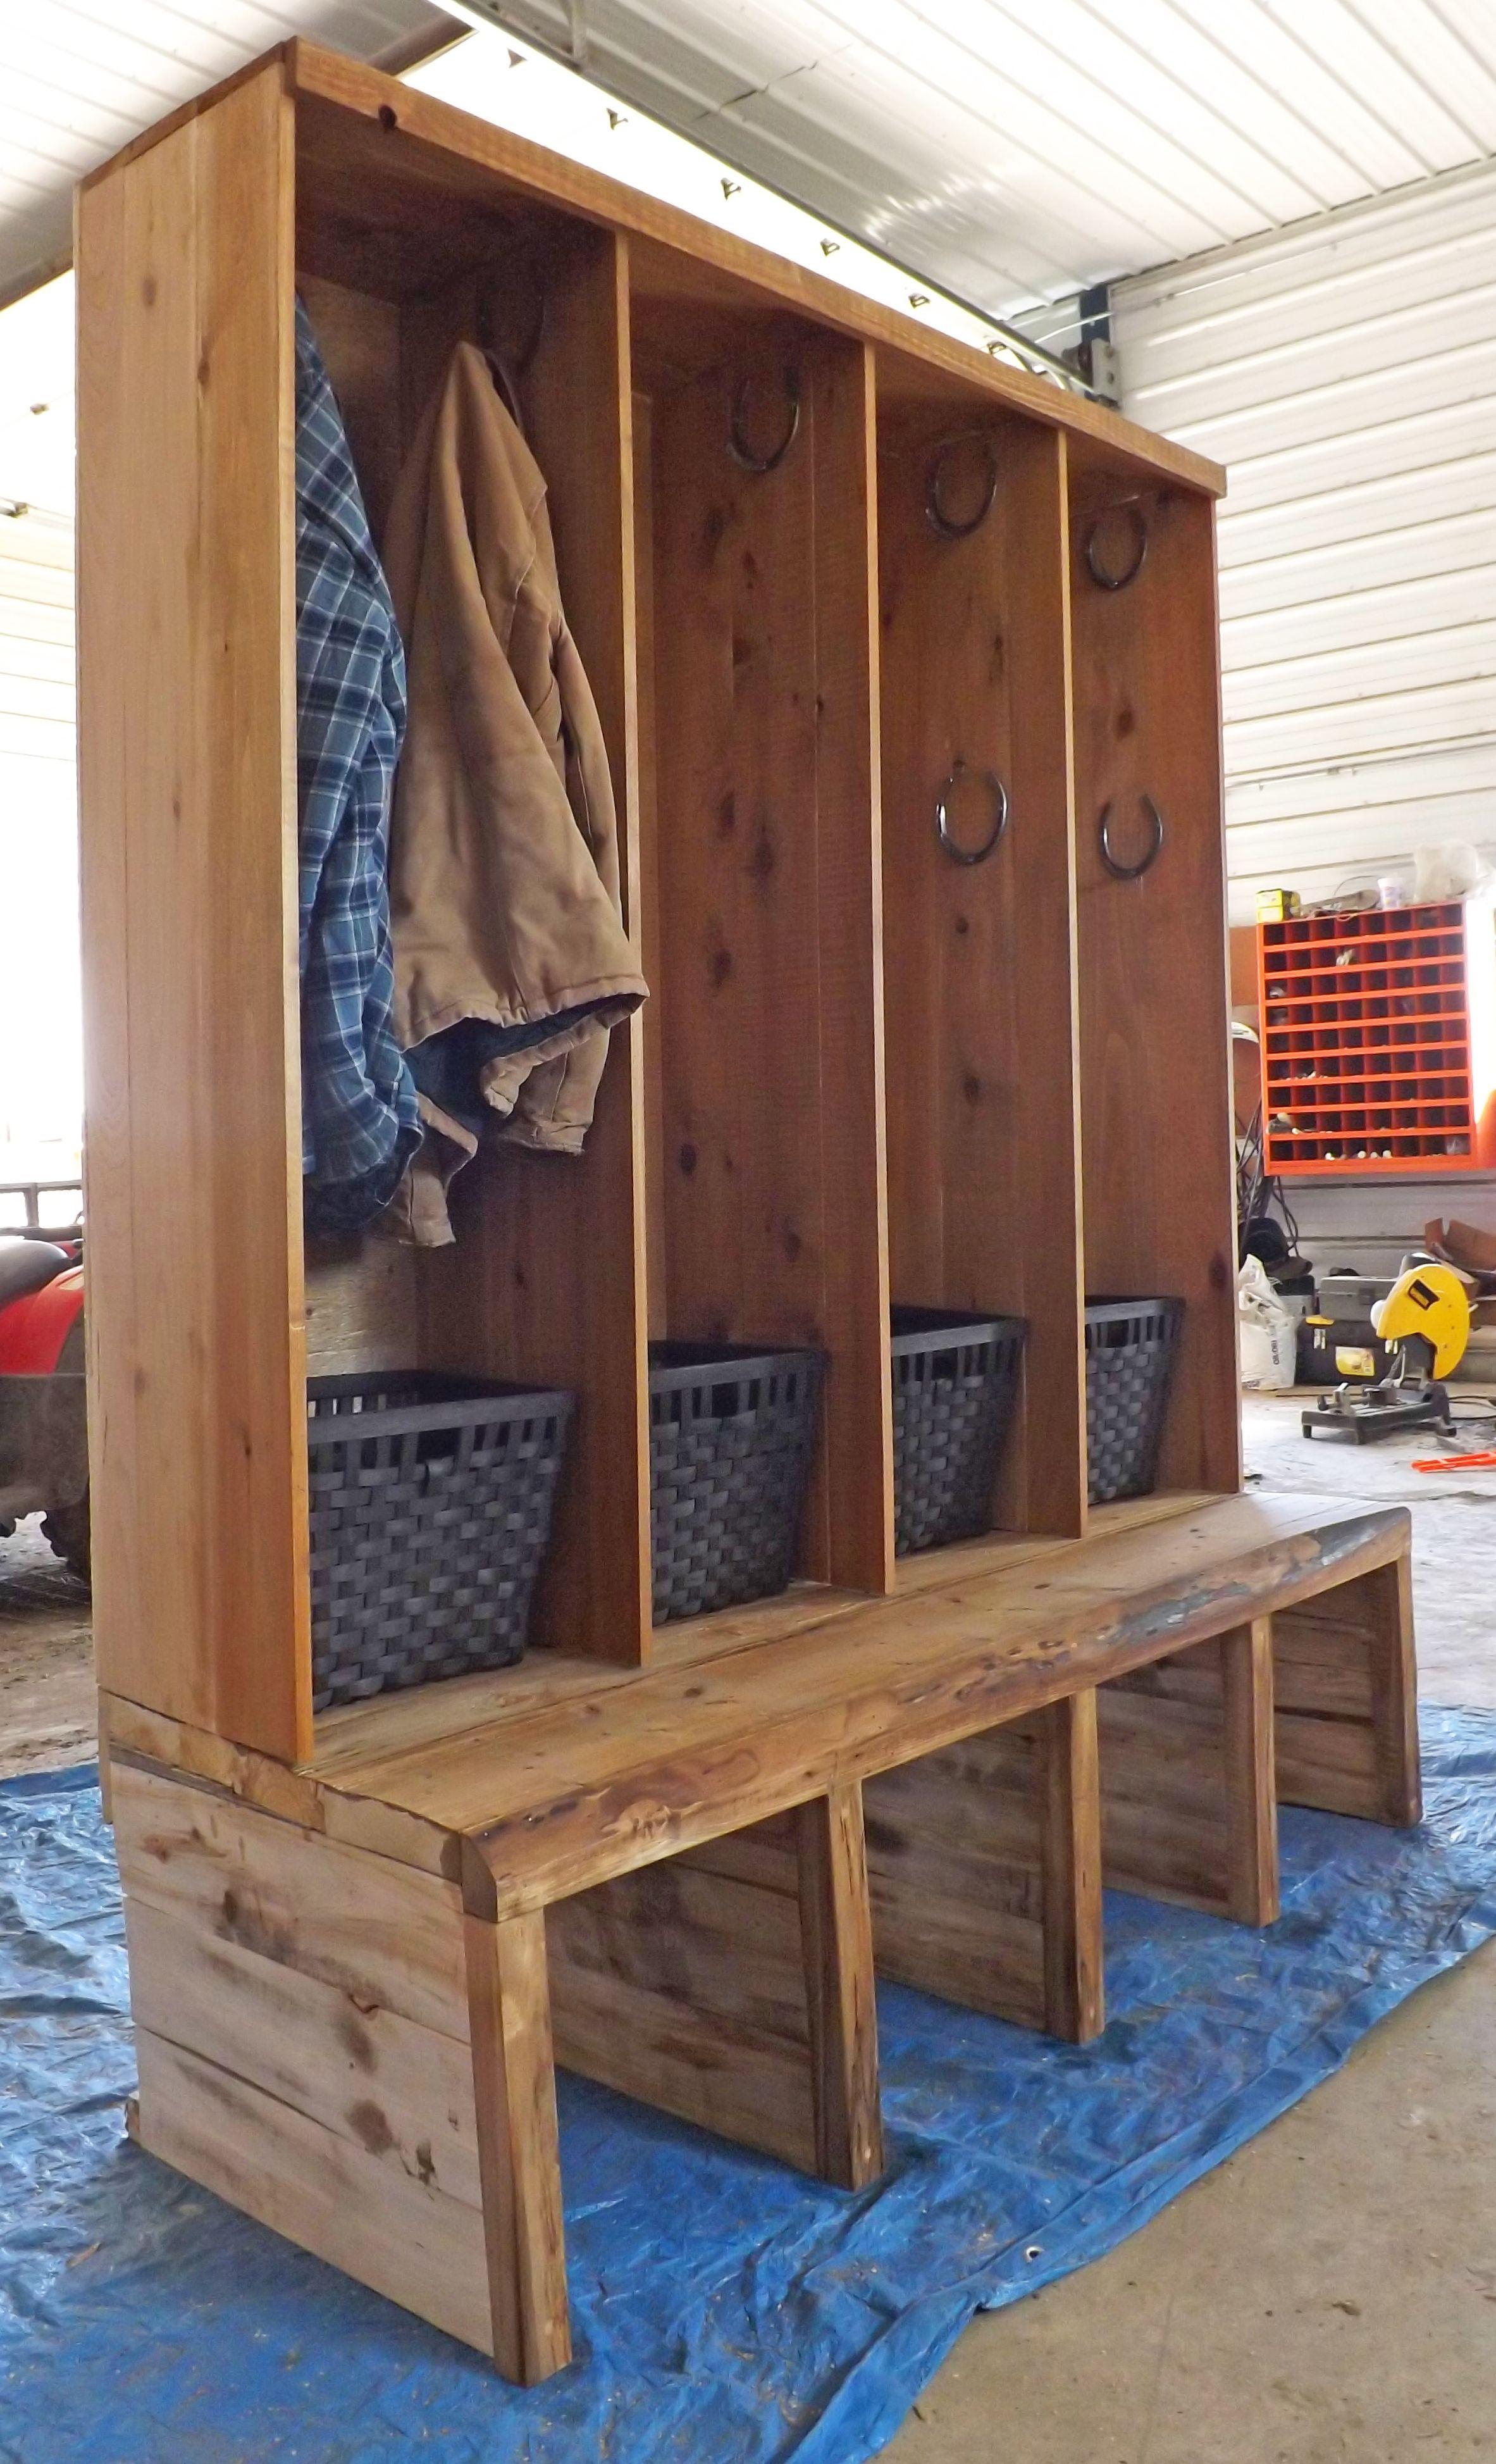 Western Rustic Front Entryway Mudroom Closet Boot Storage Mitt Glove Toque Storage And Bench With Horses Mudroom Makeover Rustic Storage Rustic Furniture